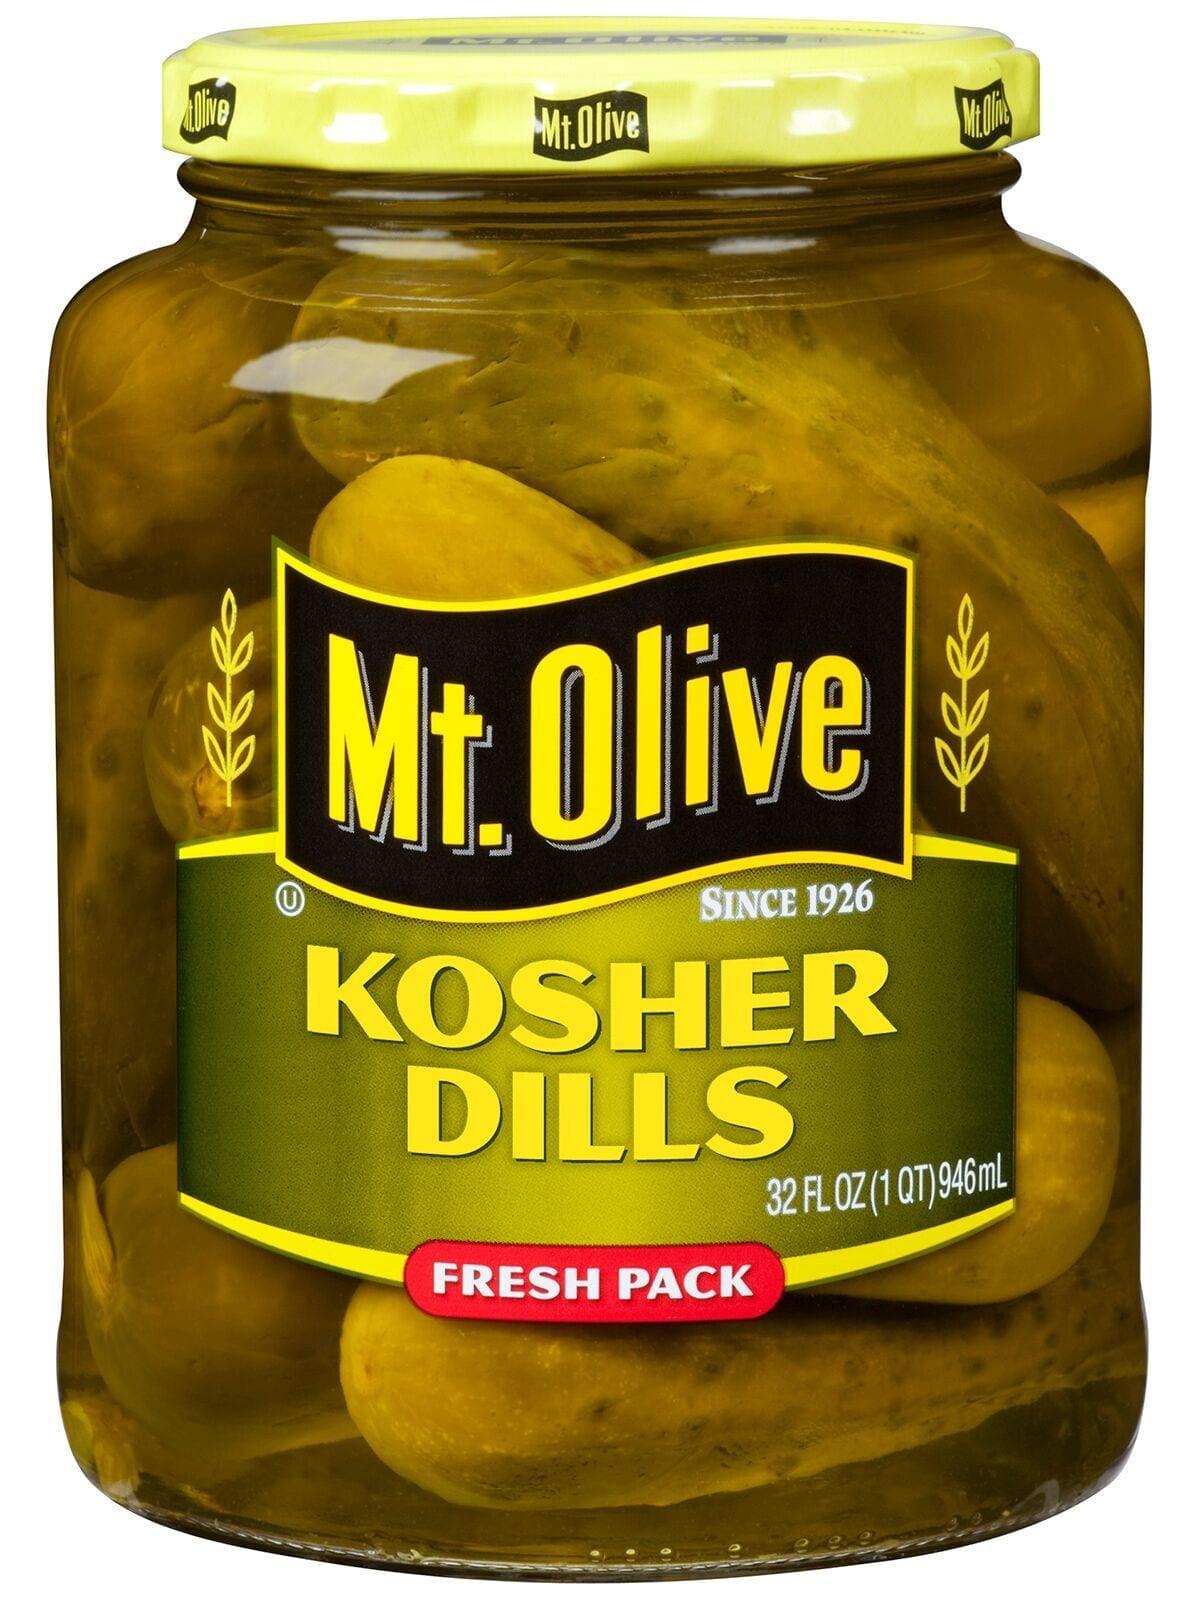 Organic Dill Pickles  Kosher Dills Mt Olive Pickles